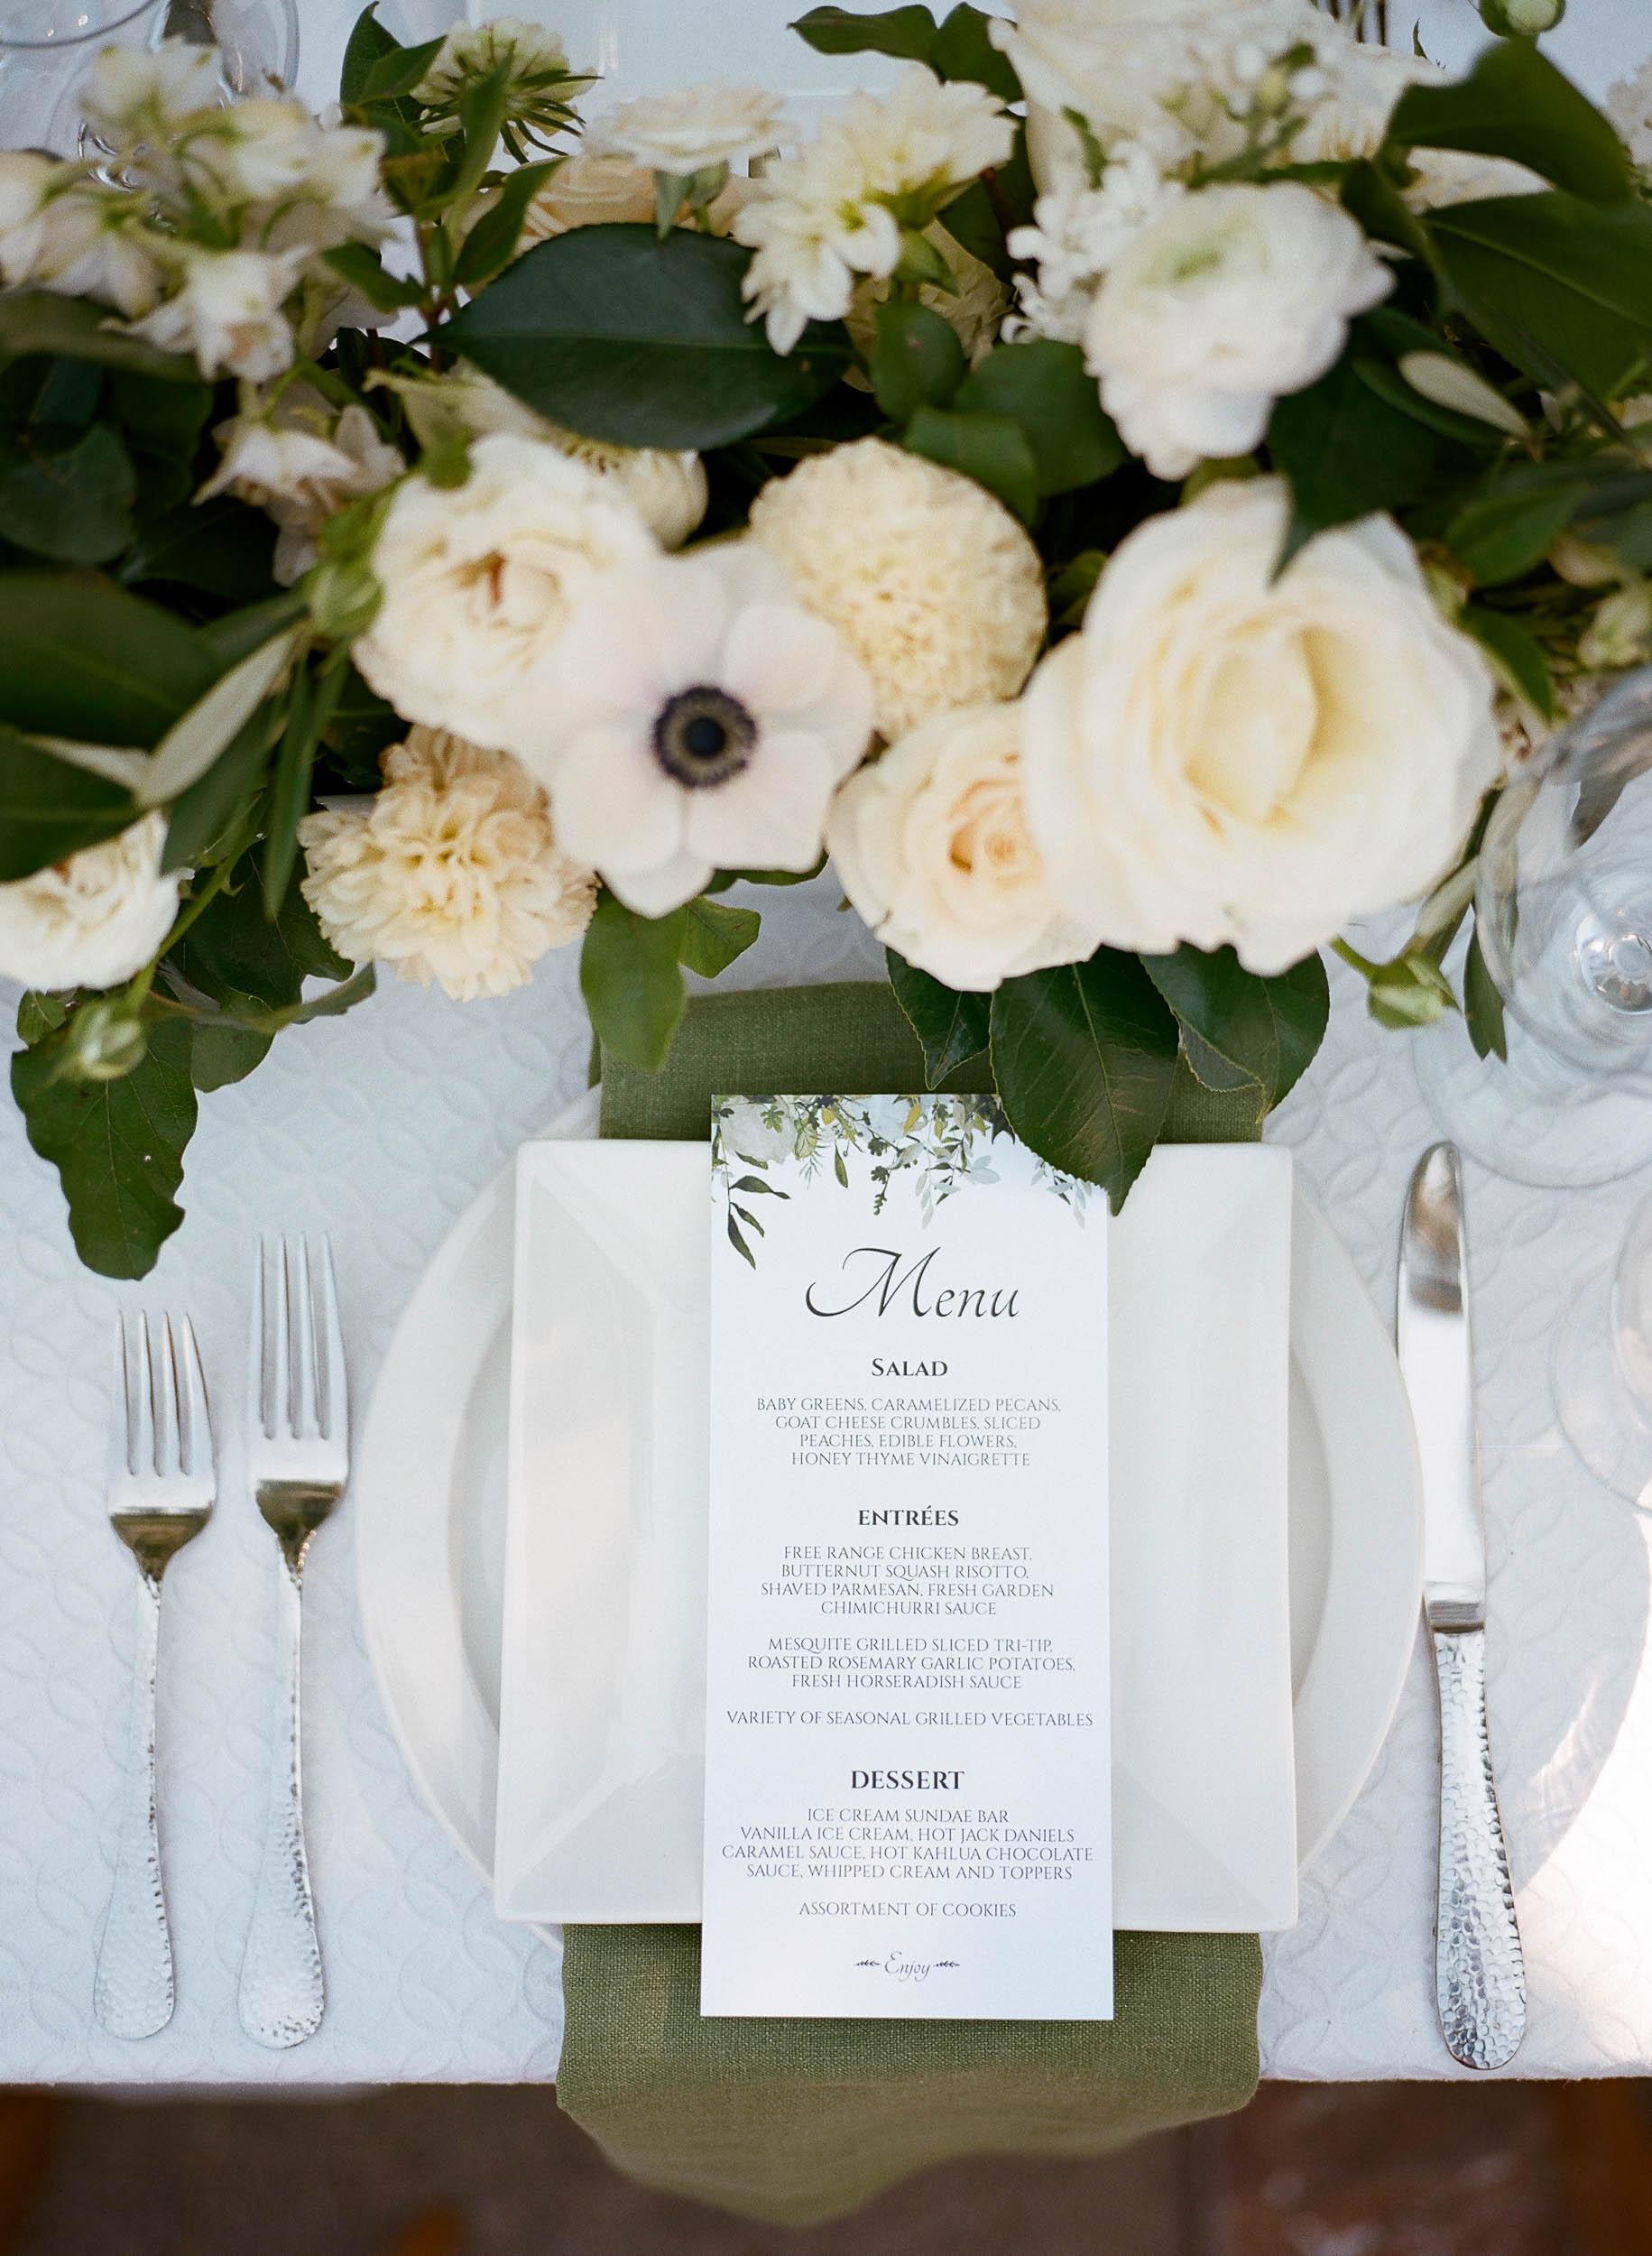 063_072118_D+K_Holman Ranch Wedding_Buena Lane Photography_00005433_164 copy.jpg